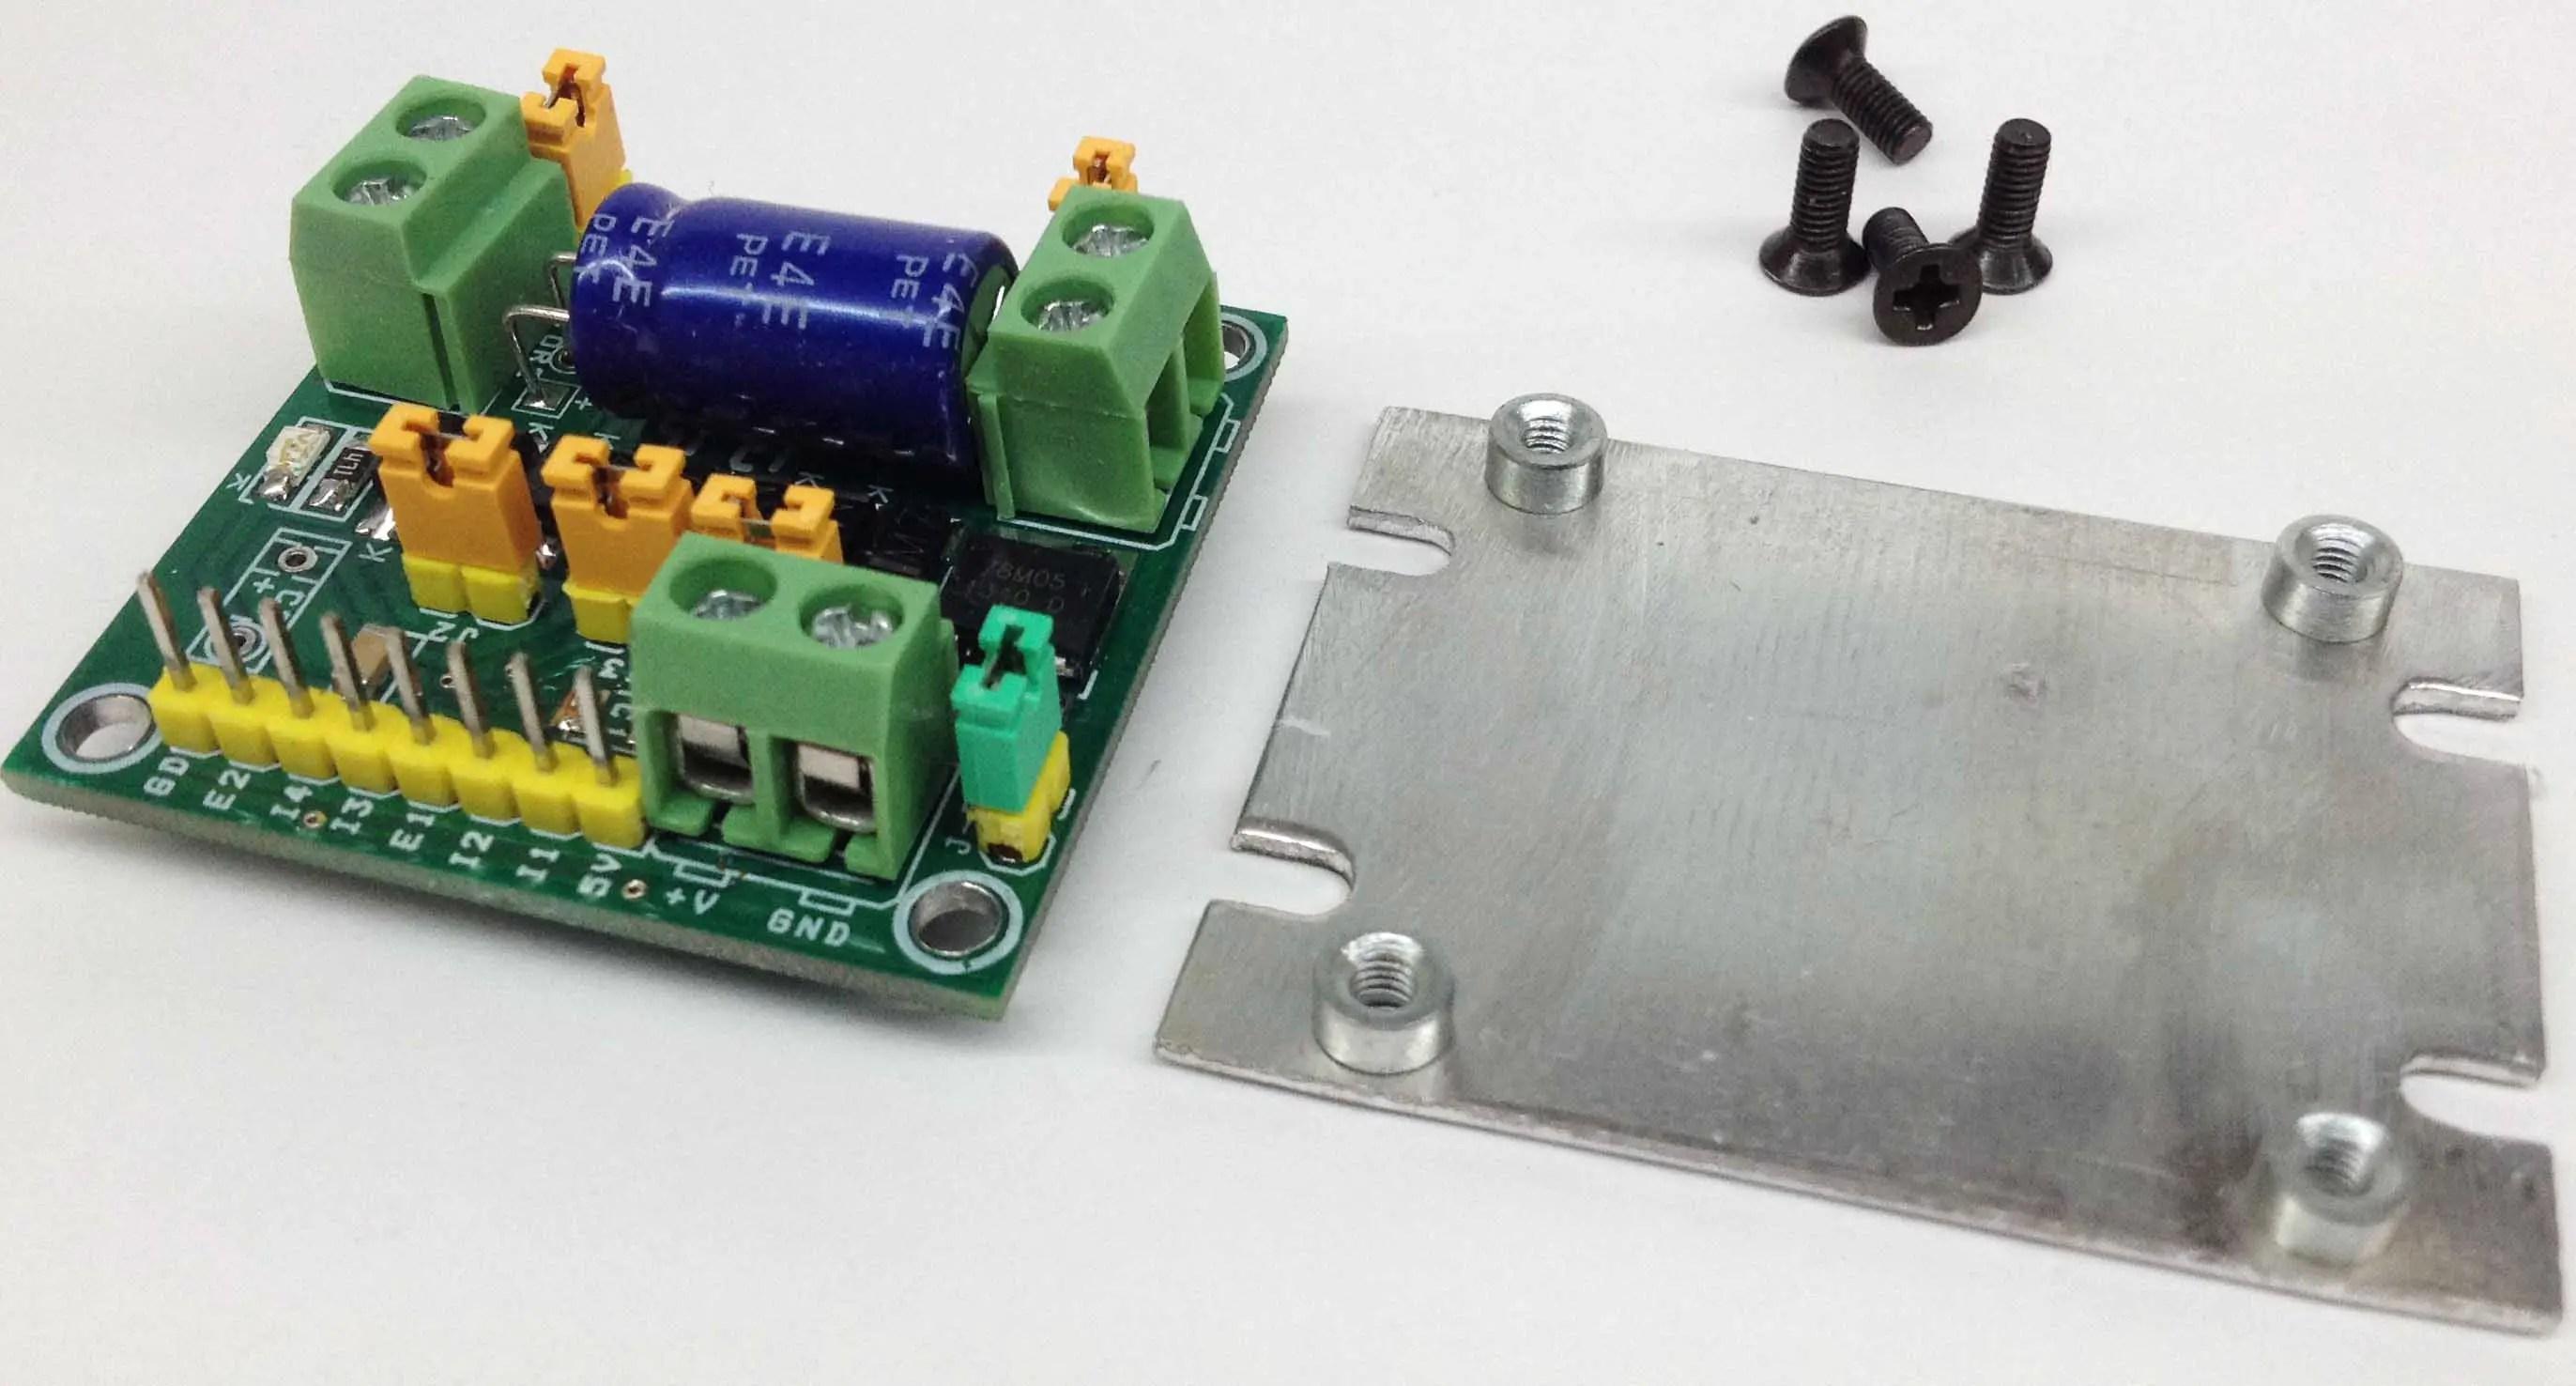 Circuit Diagram Moreover 7805 Voltage Regulator Circuit On Solid